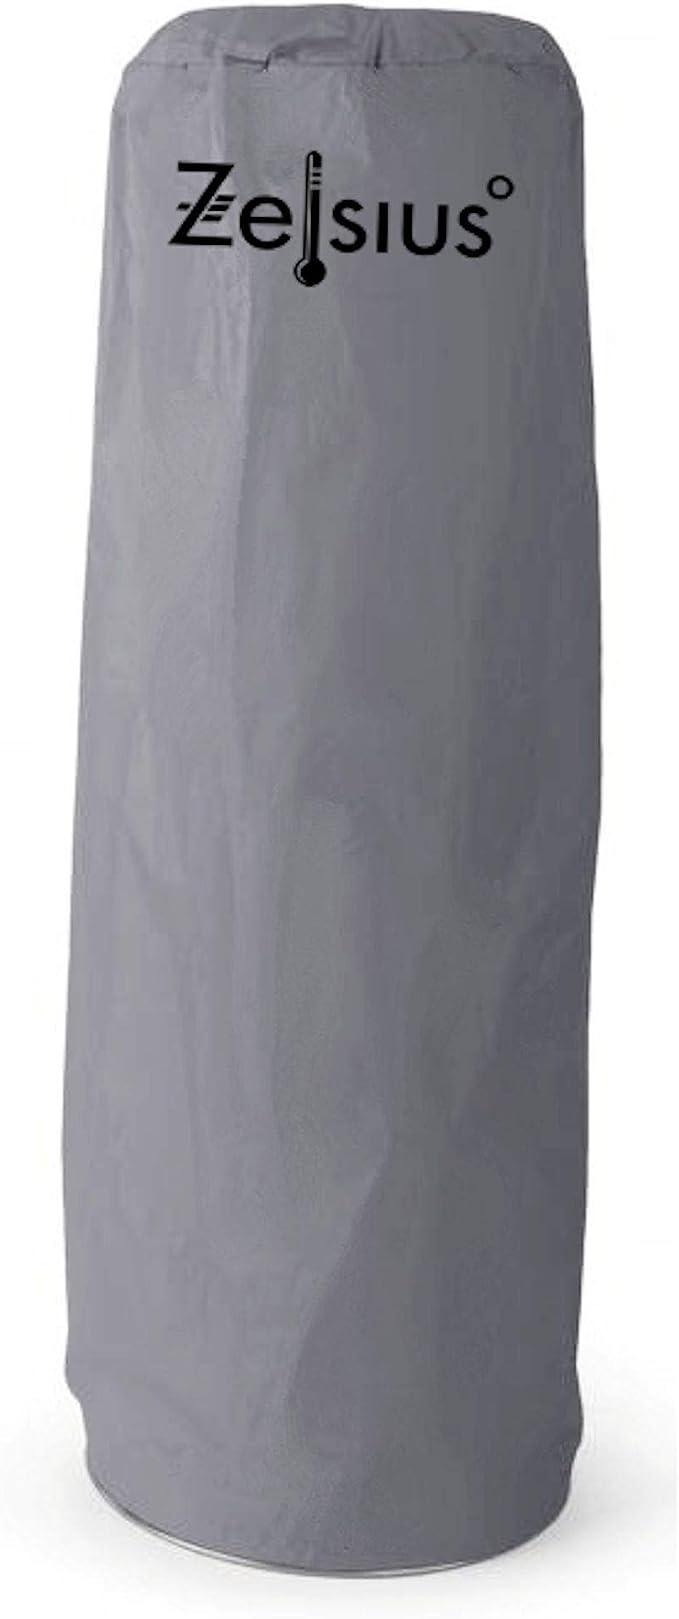 Schutzhülle Abdeckhaube Heizstrahler Heizpilz Terrassenheizstrahler  225 x 55 cm